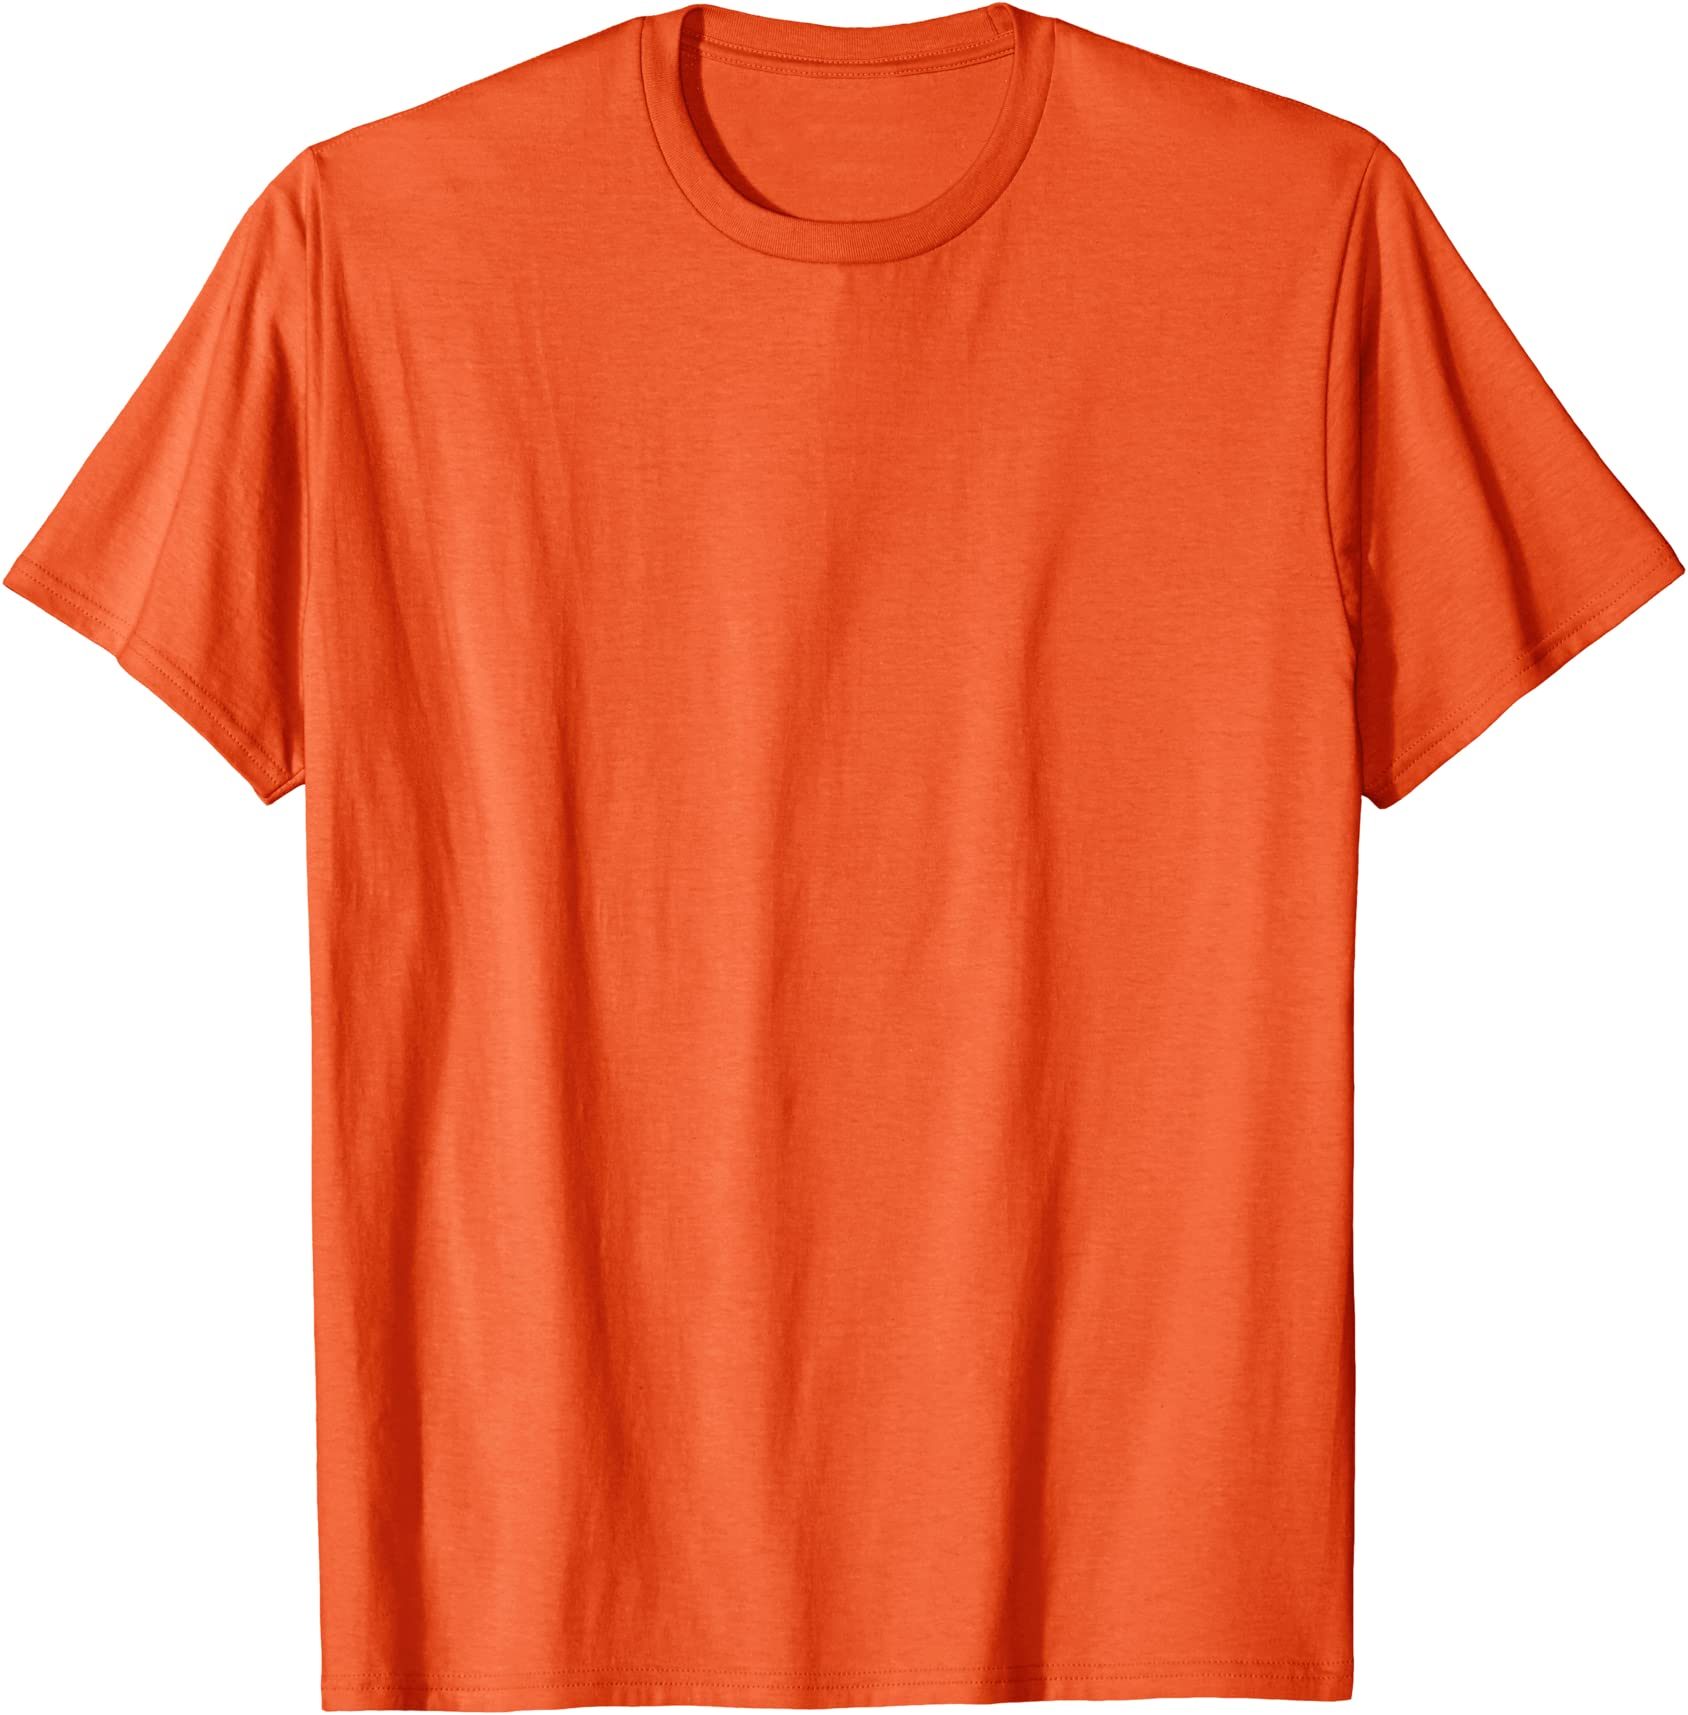 Youth Camp Half-Blood T Shirt